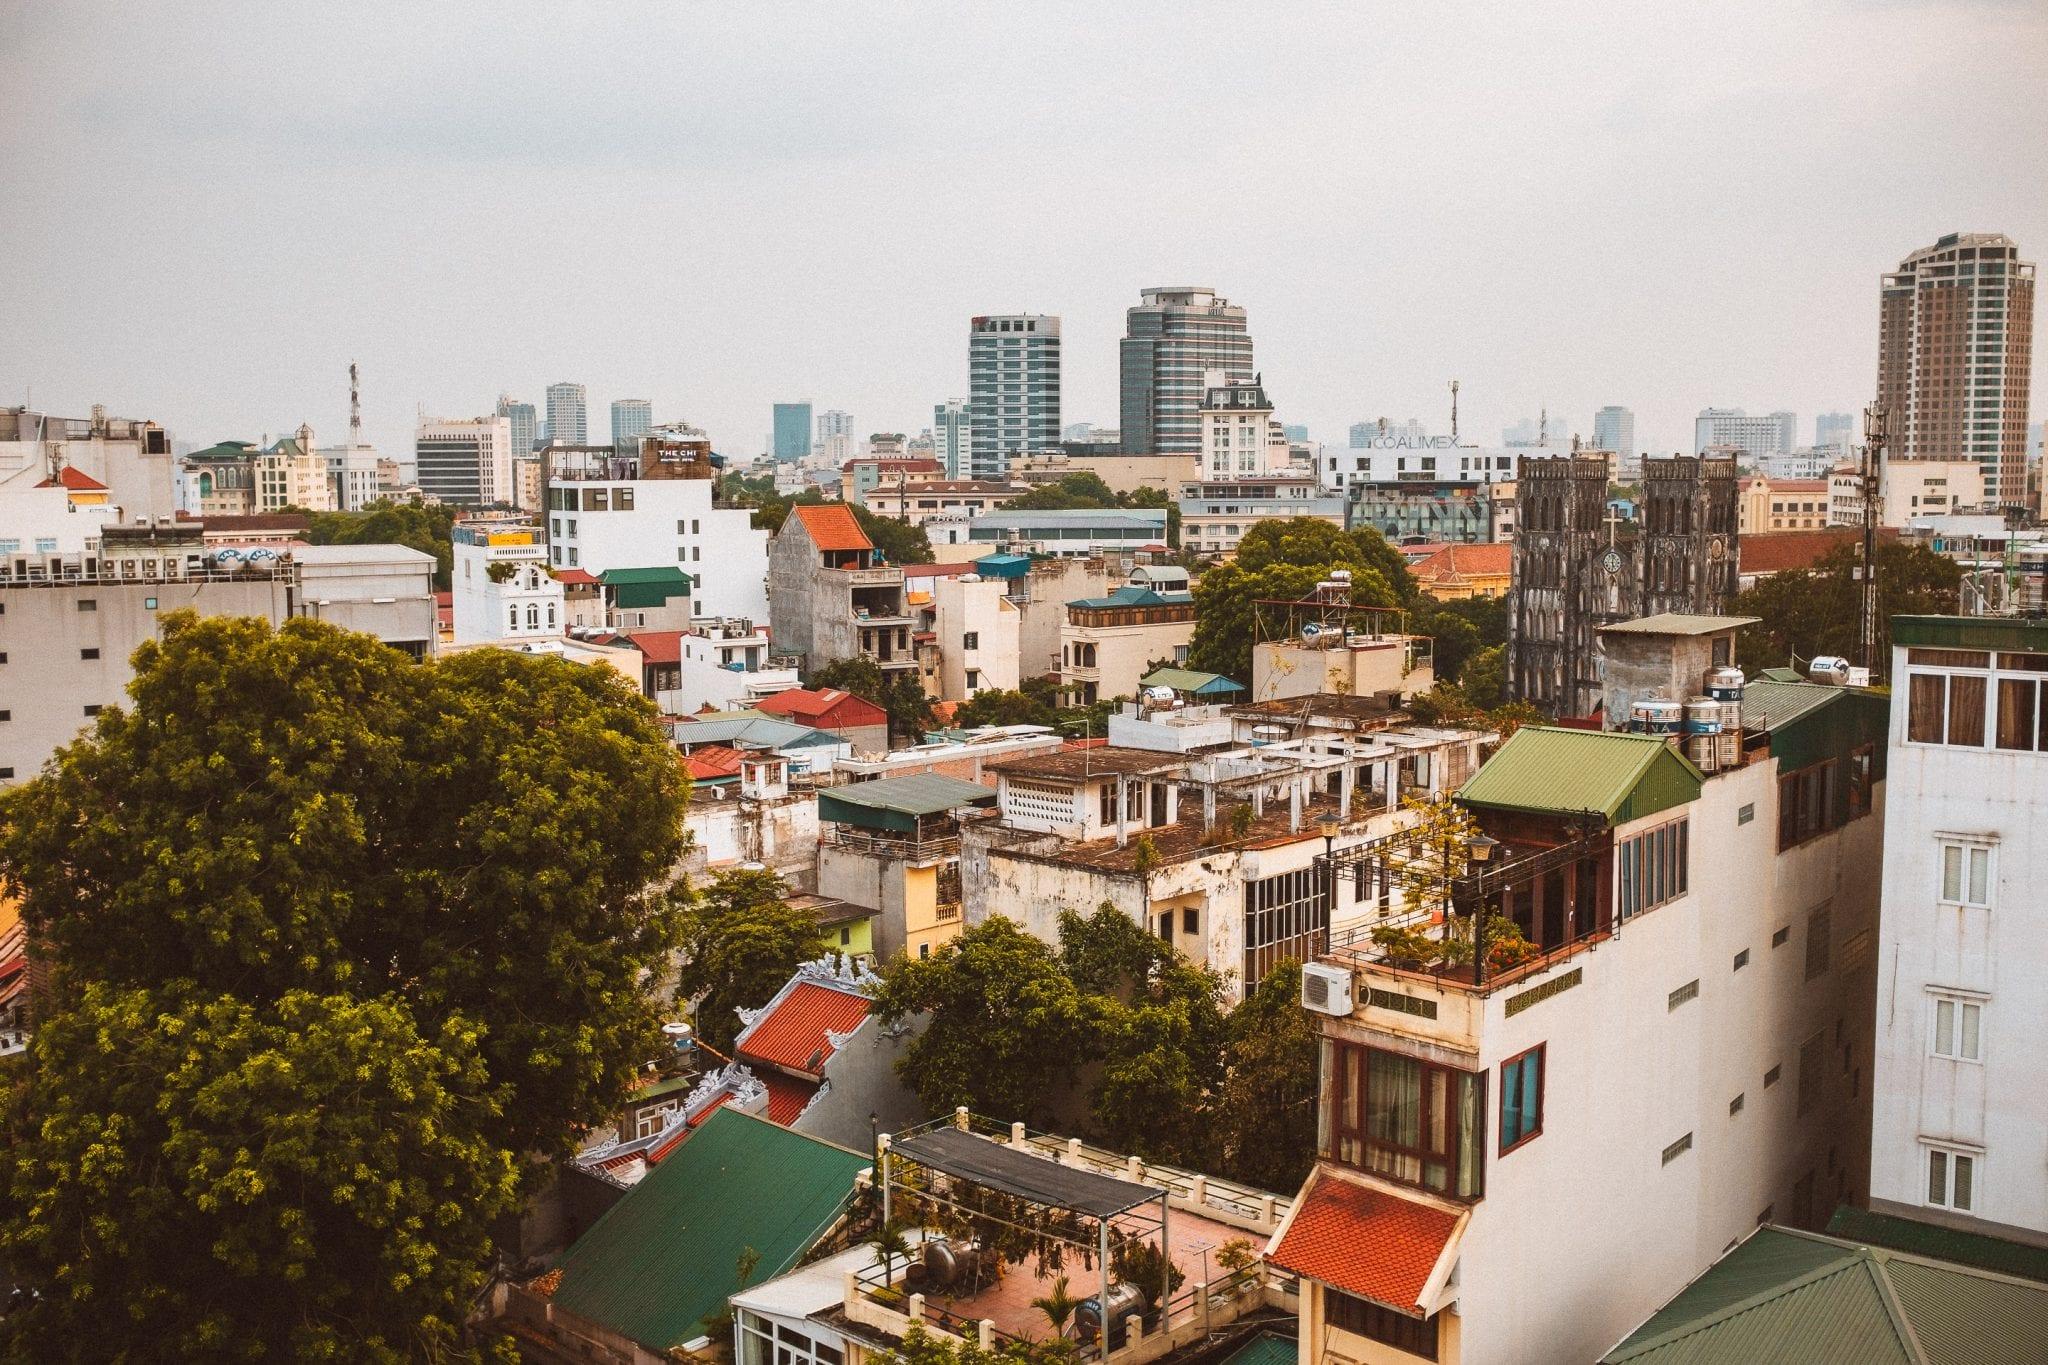 looking across the buildings of hanoi in vietnam